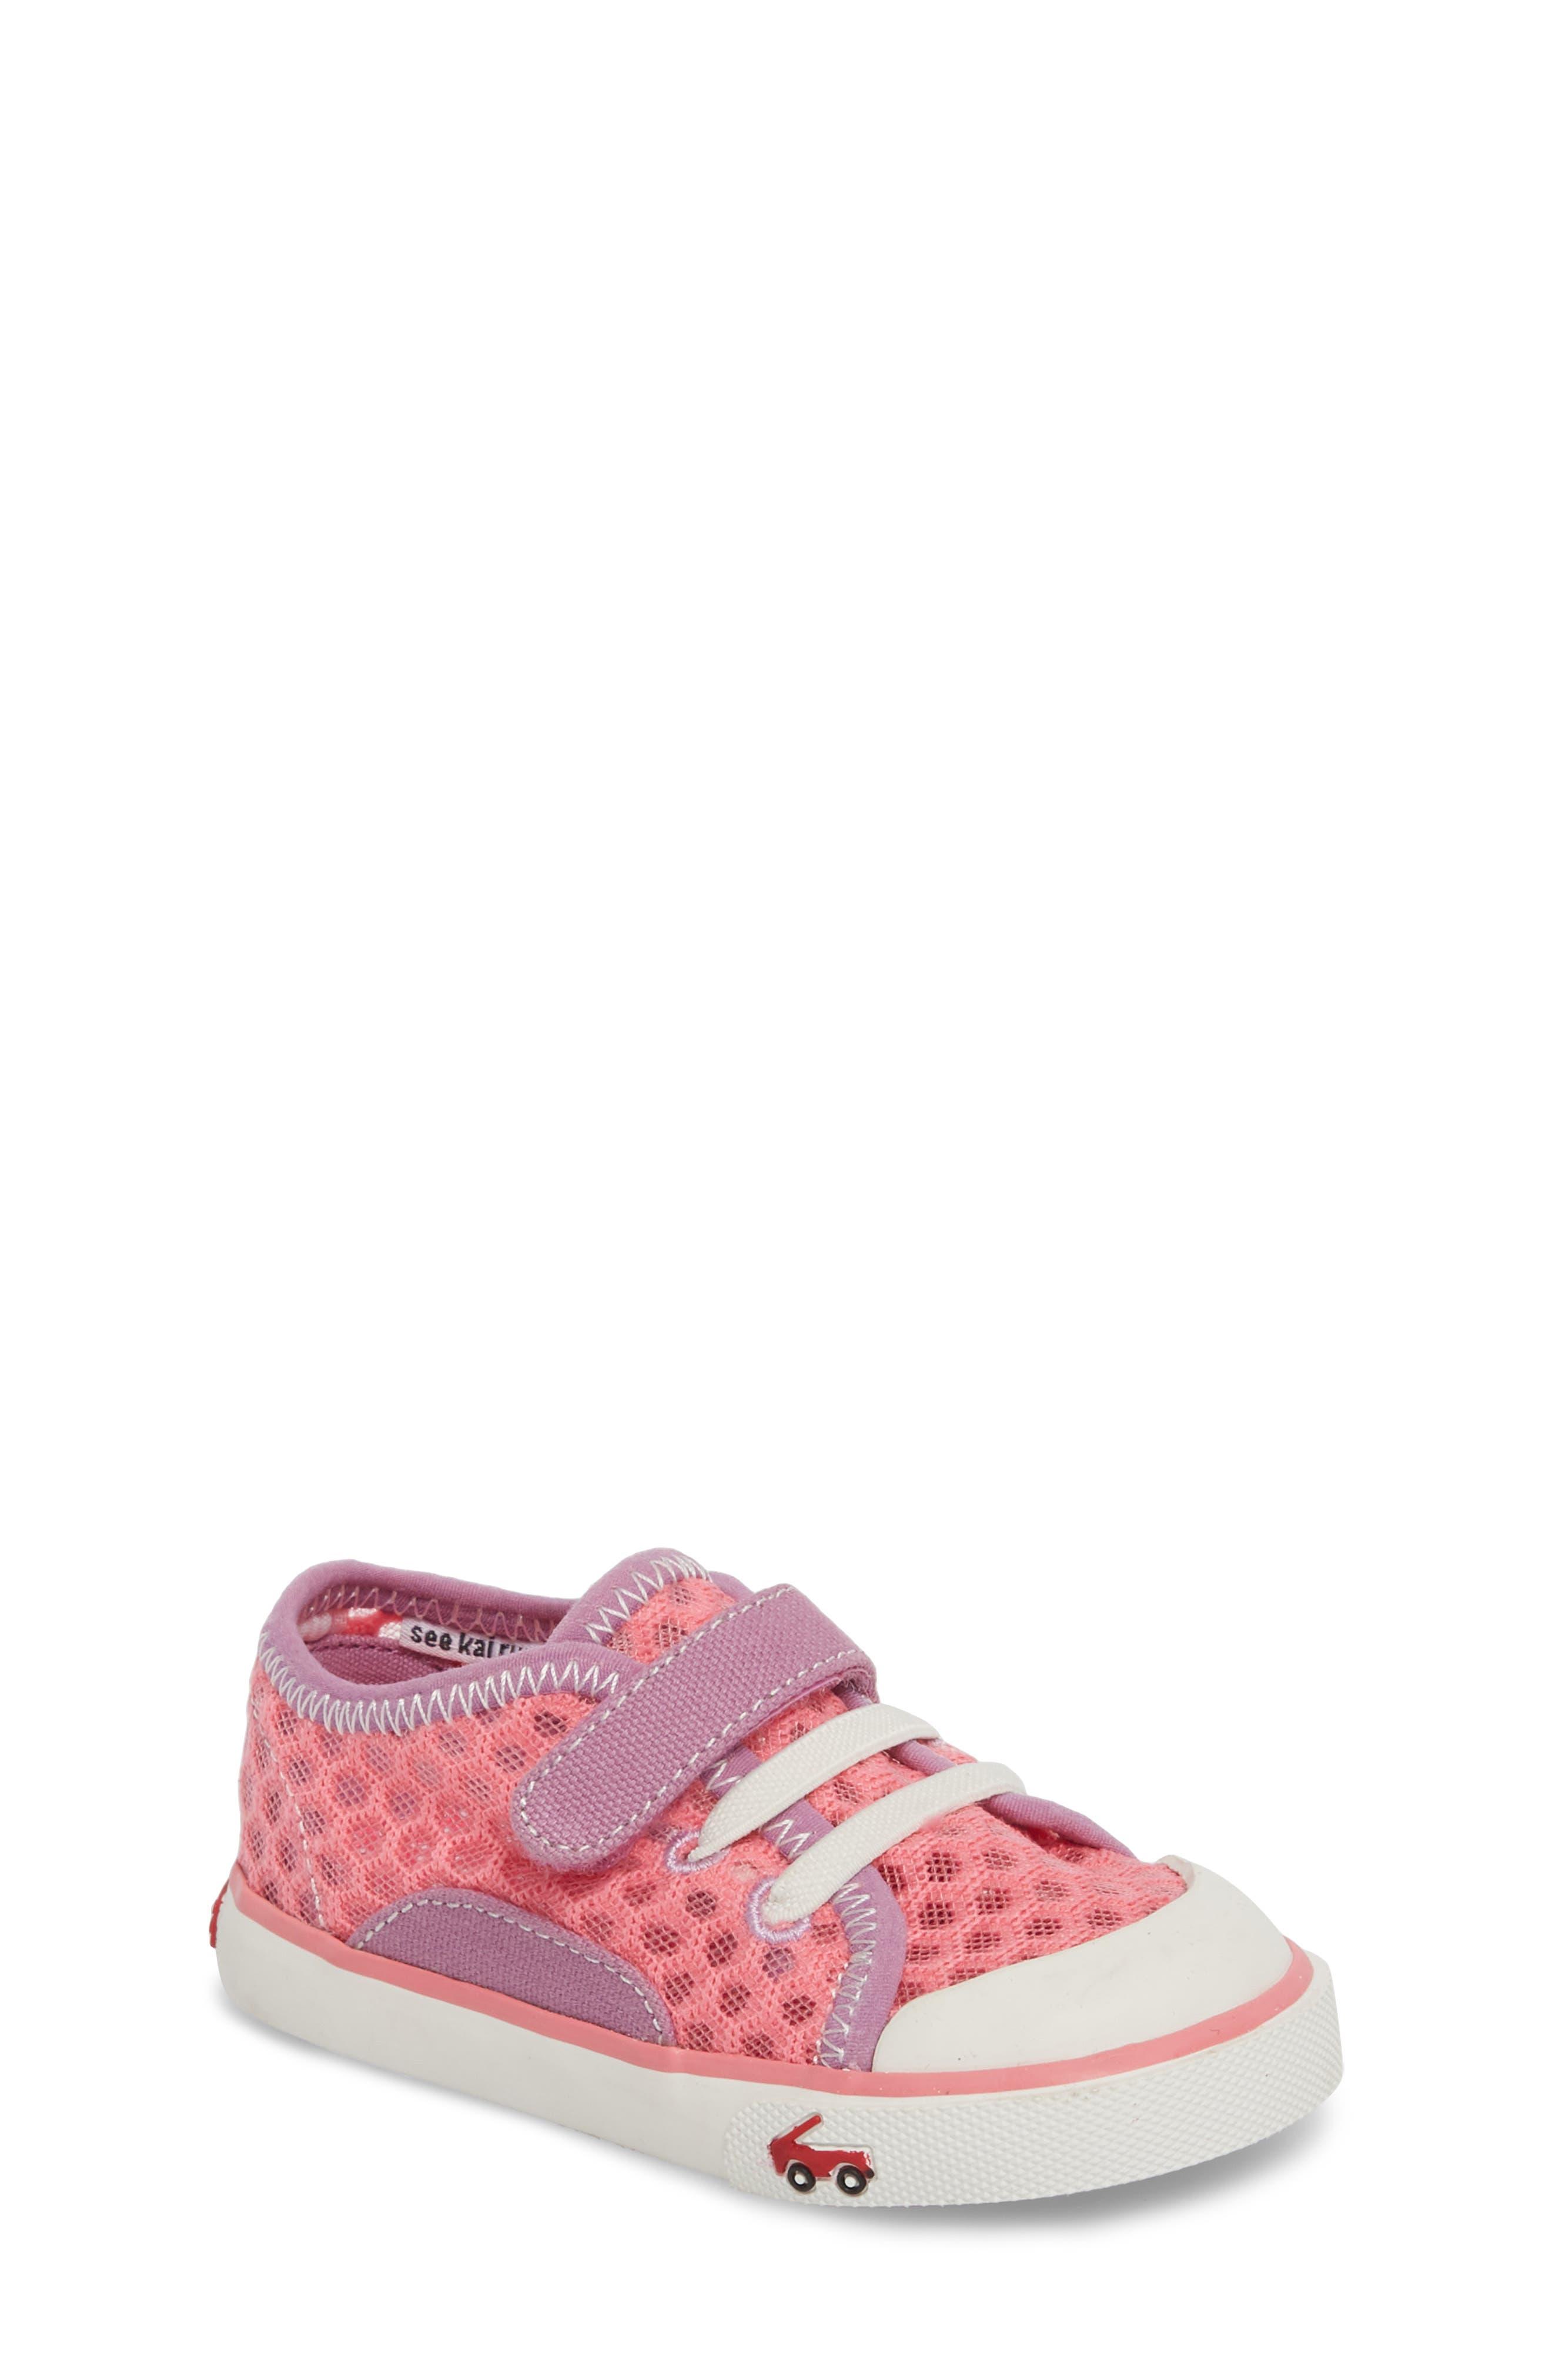 Saylor Sneaker,                         Main,                         color, 670